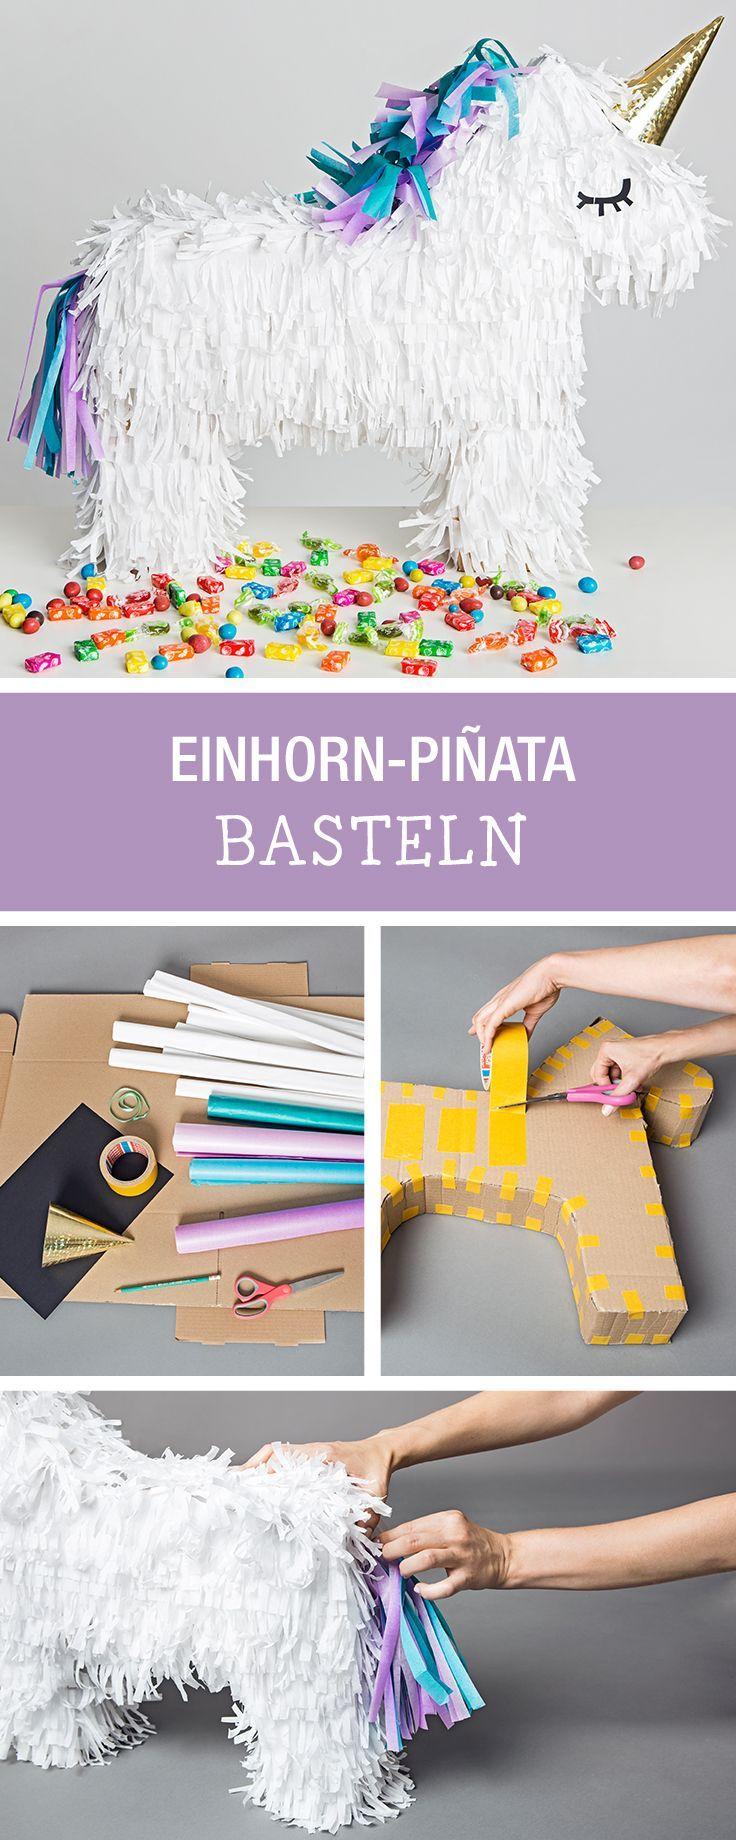 Diy Anleitung Einhorn Pinata Basteln Via Dawanda Com Pinterest